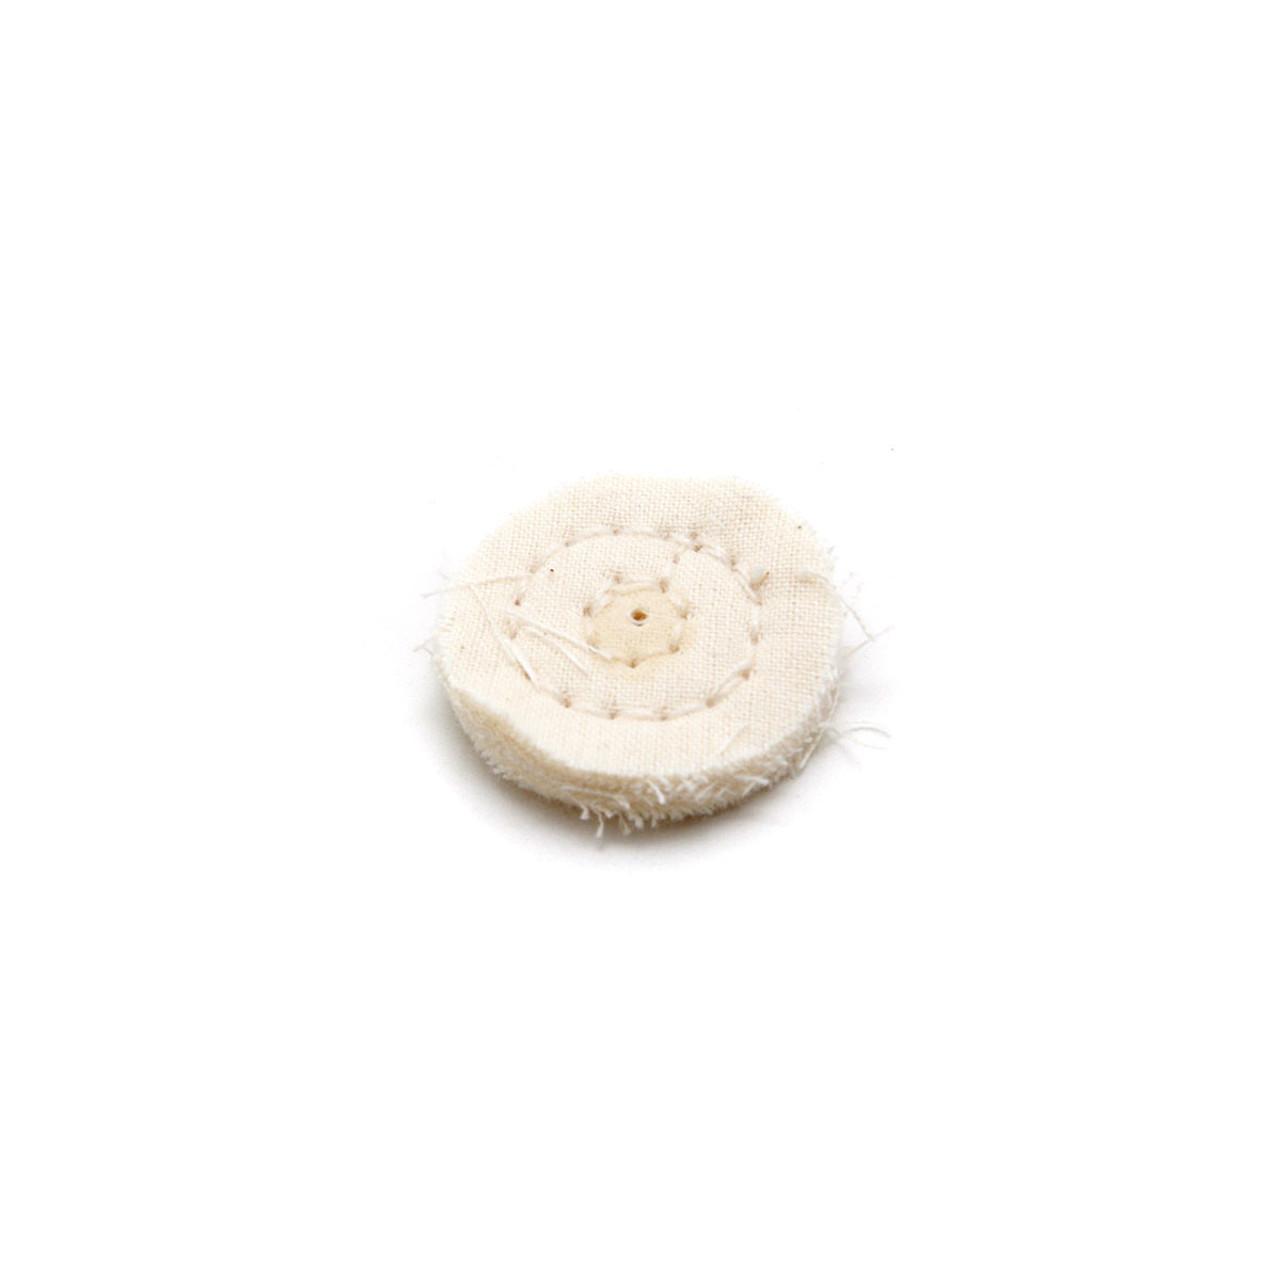 "Foredom Muslin Cotton Buff - 2.54cm (1"")"